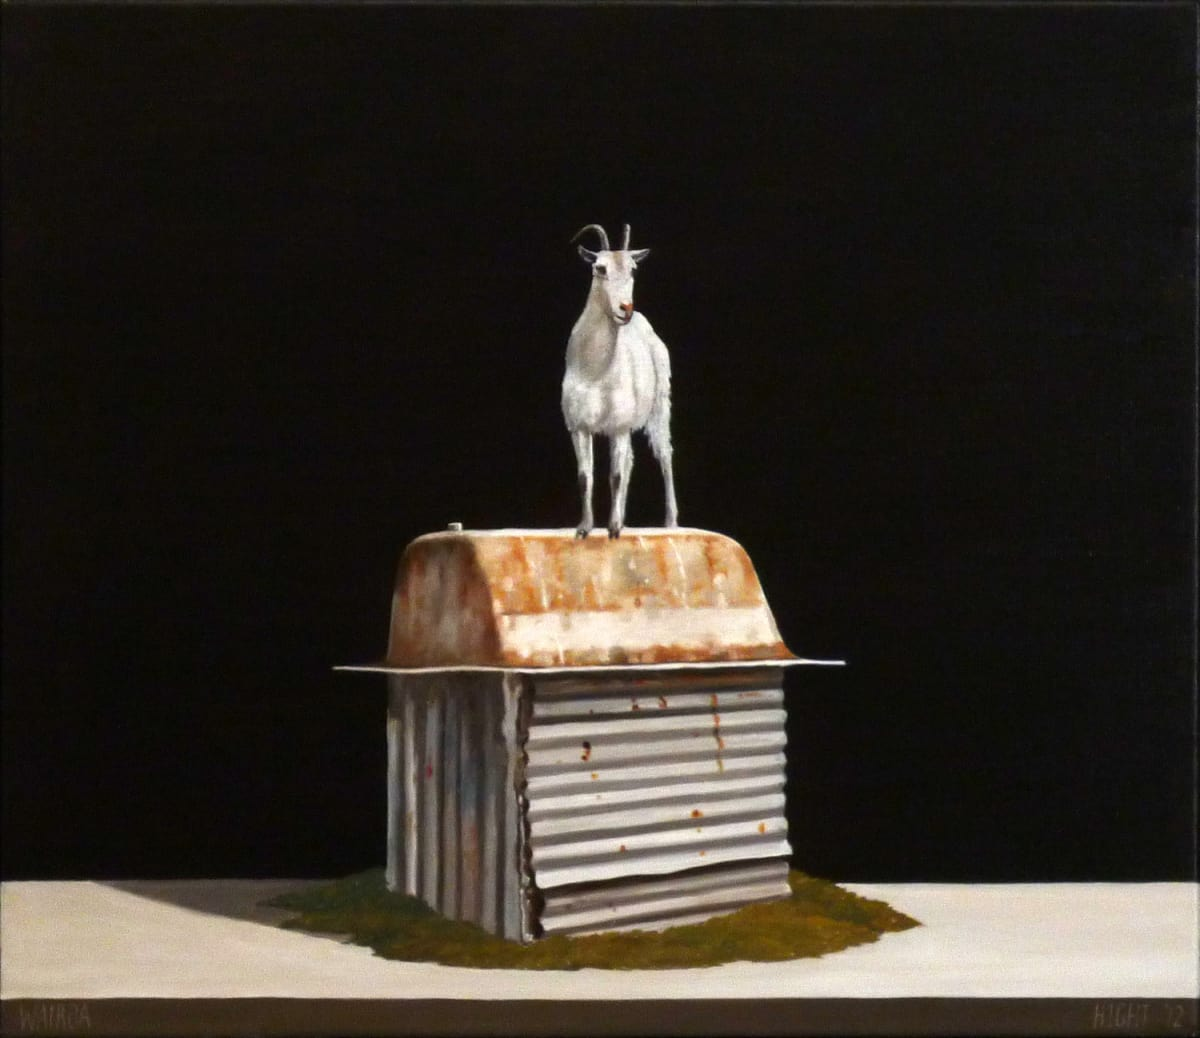 Michael Hight  Waitoa, 2012  Oil on linen  14 x 16.1 in 35.5 x 41 cm